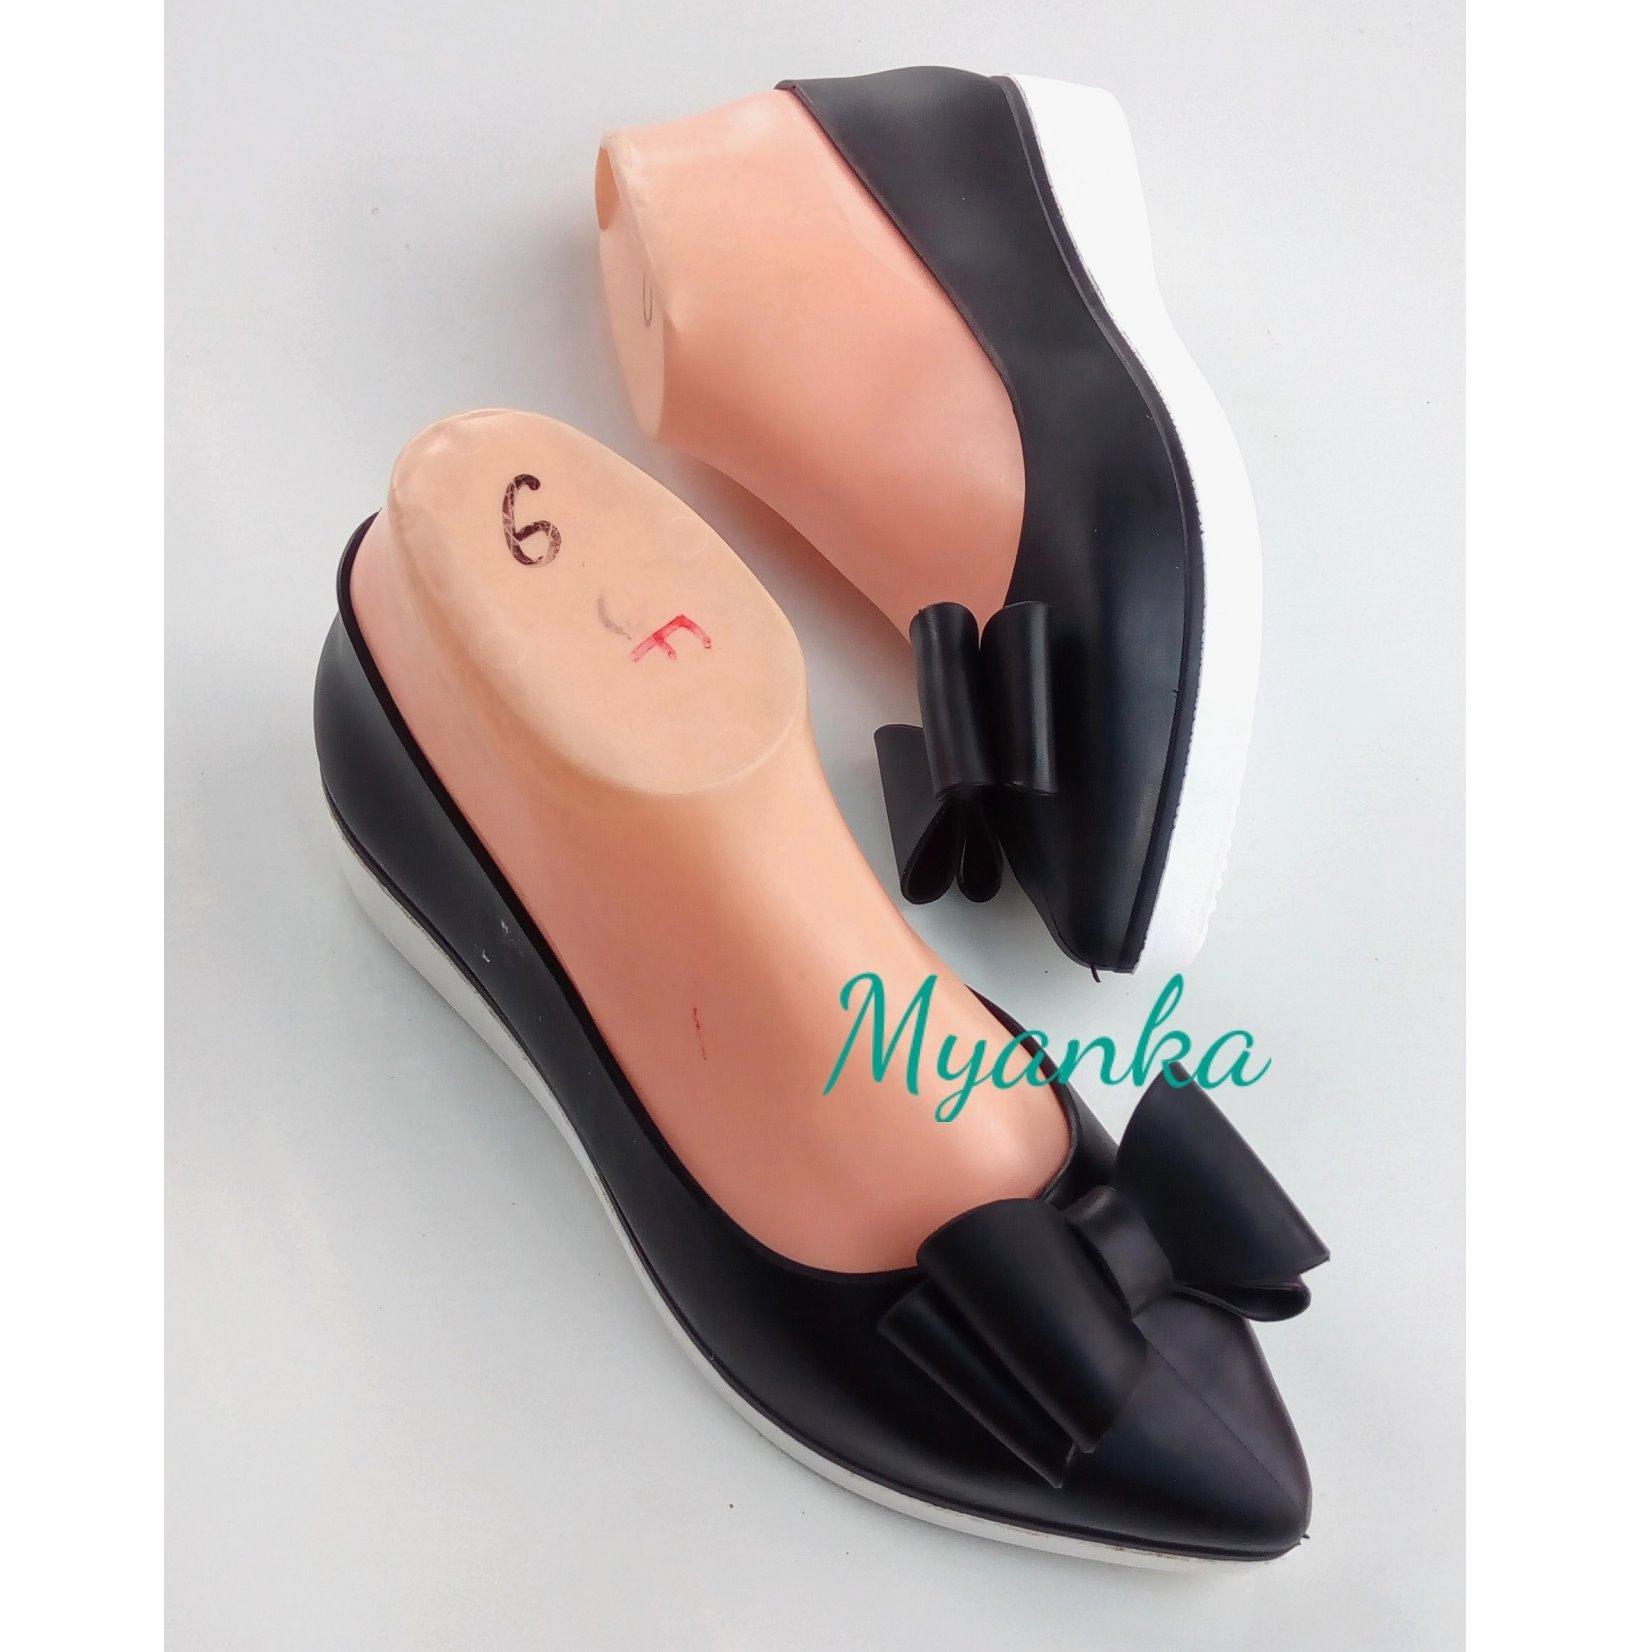 Myanka Jelly Shoes Lancip Acelly Pita - Sepatu Wanita -